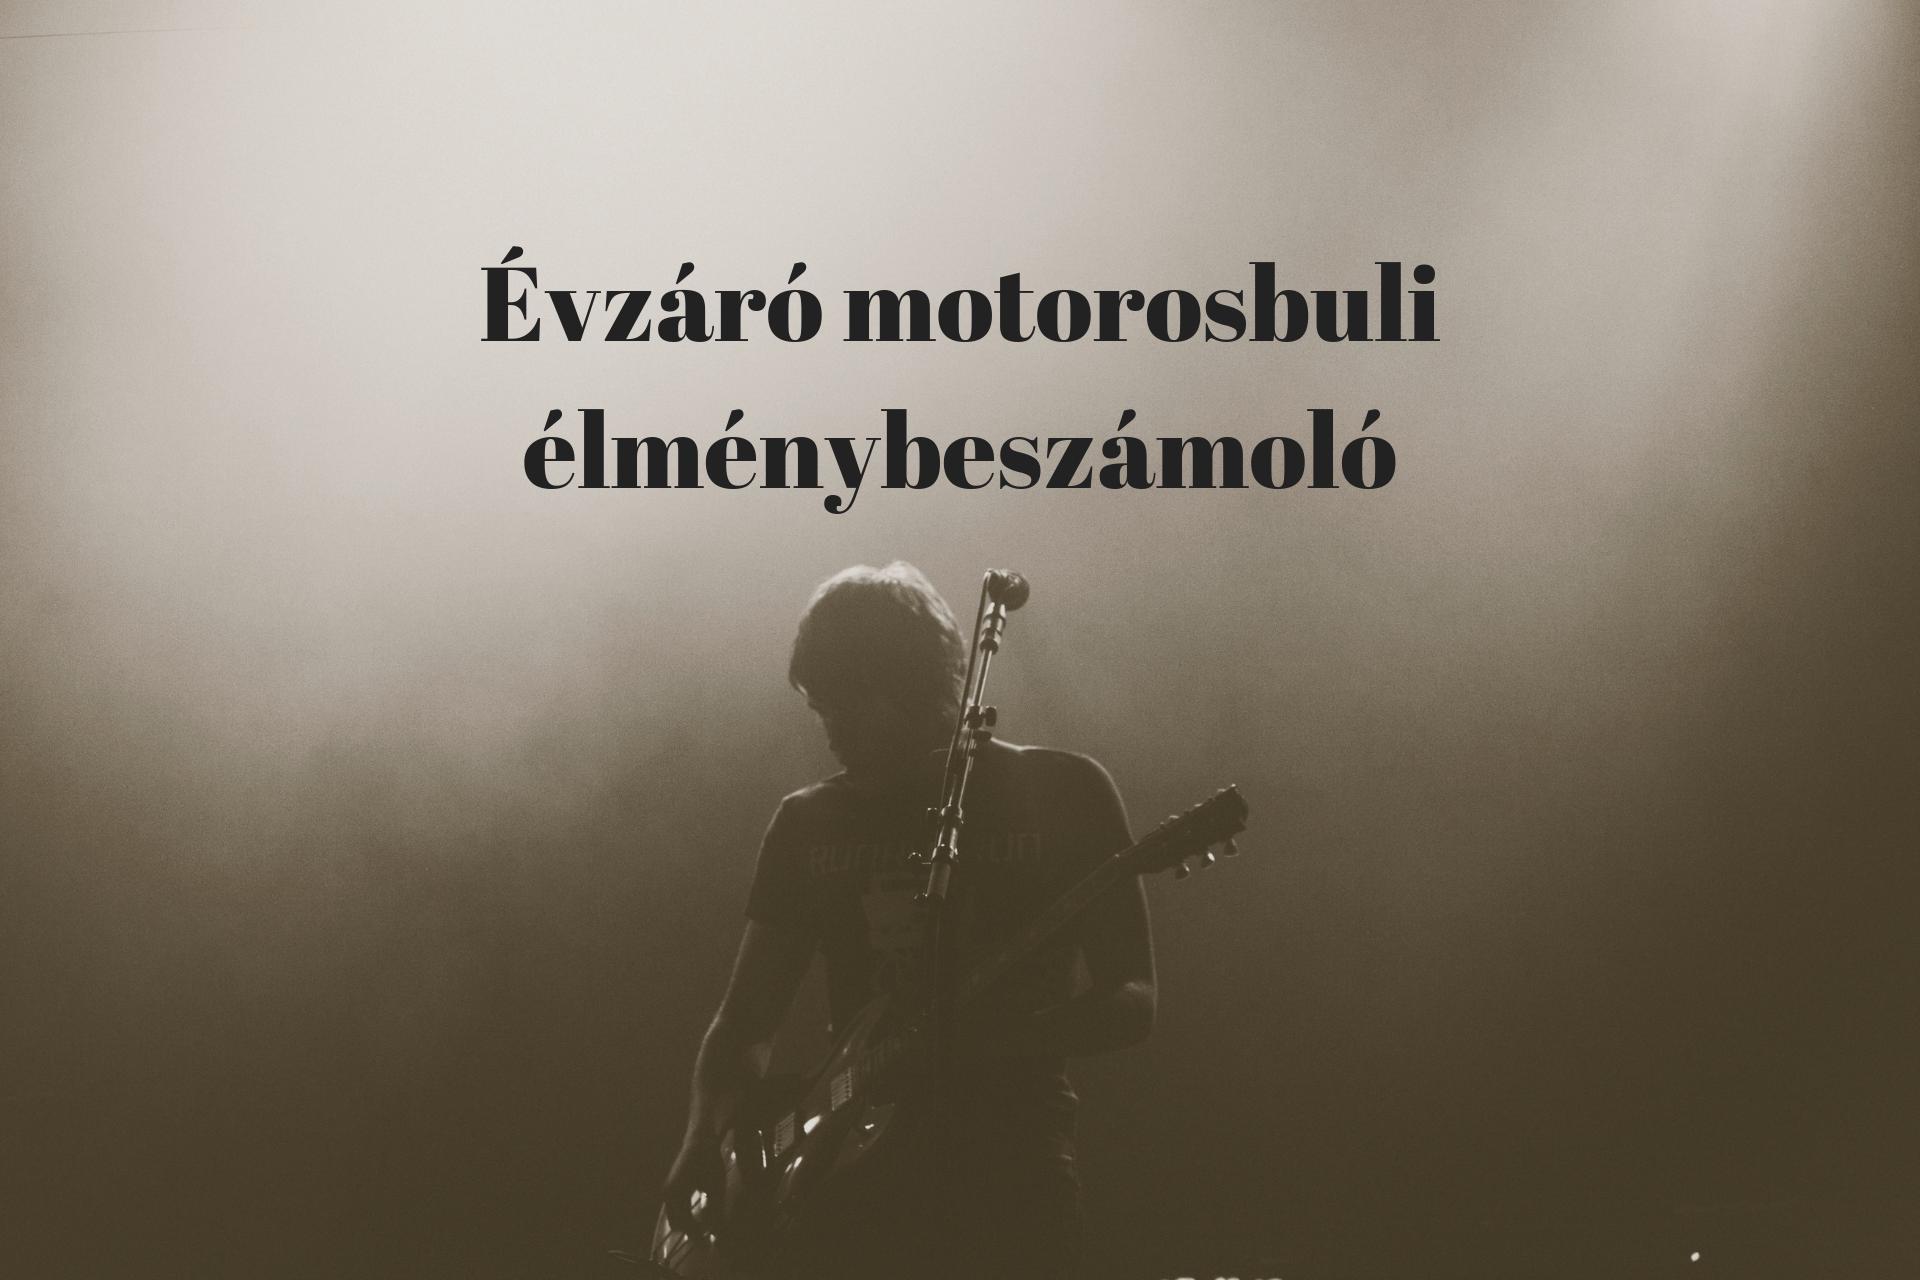 evzaro_motorosbuli_elmenybeszamolo.png